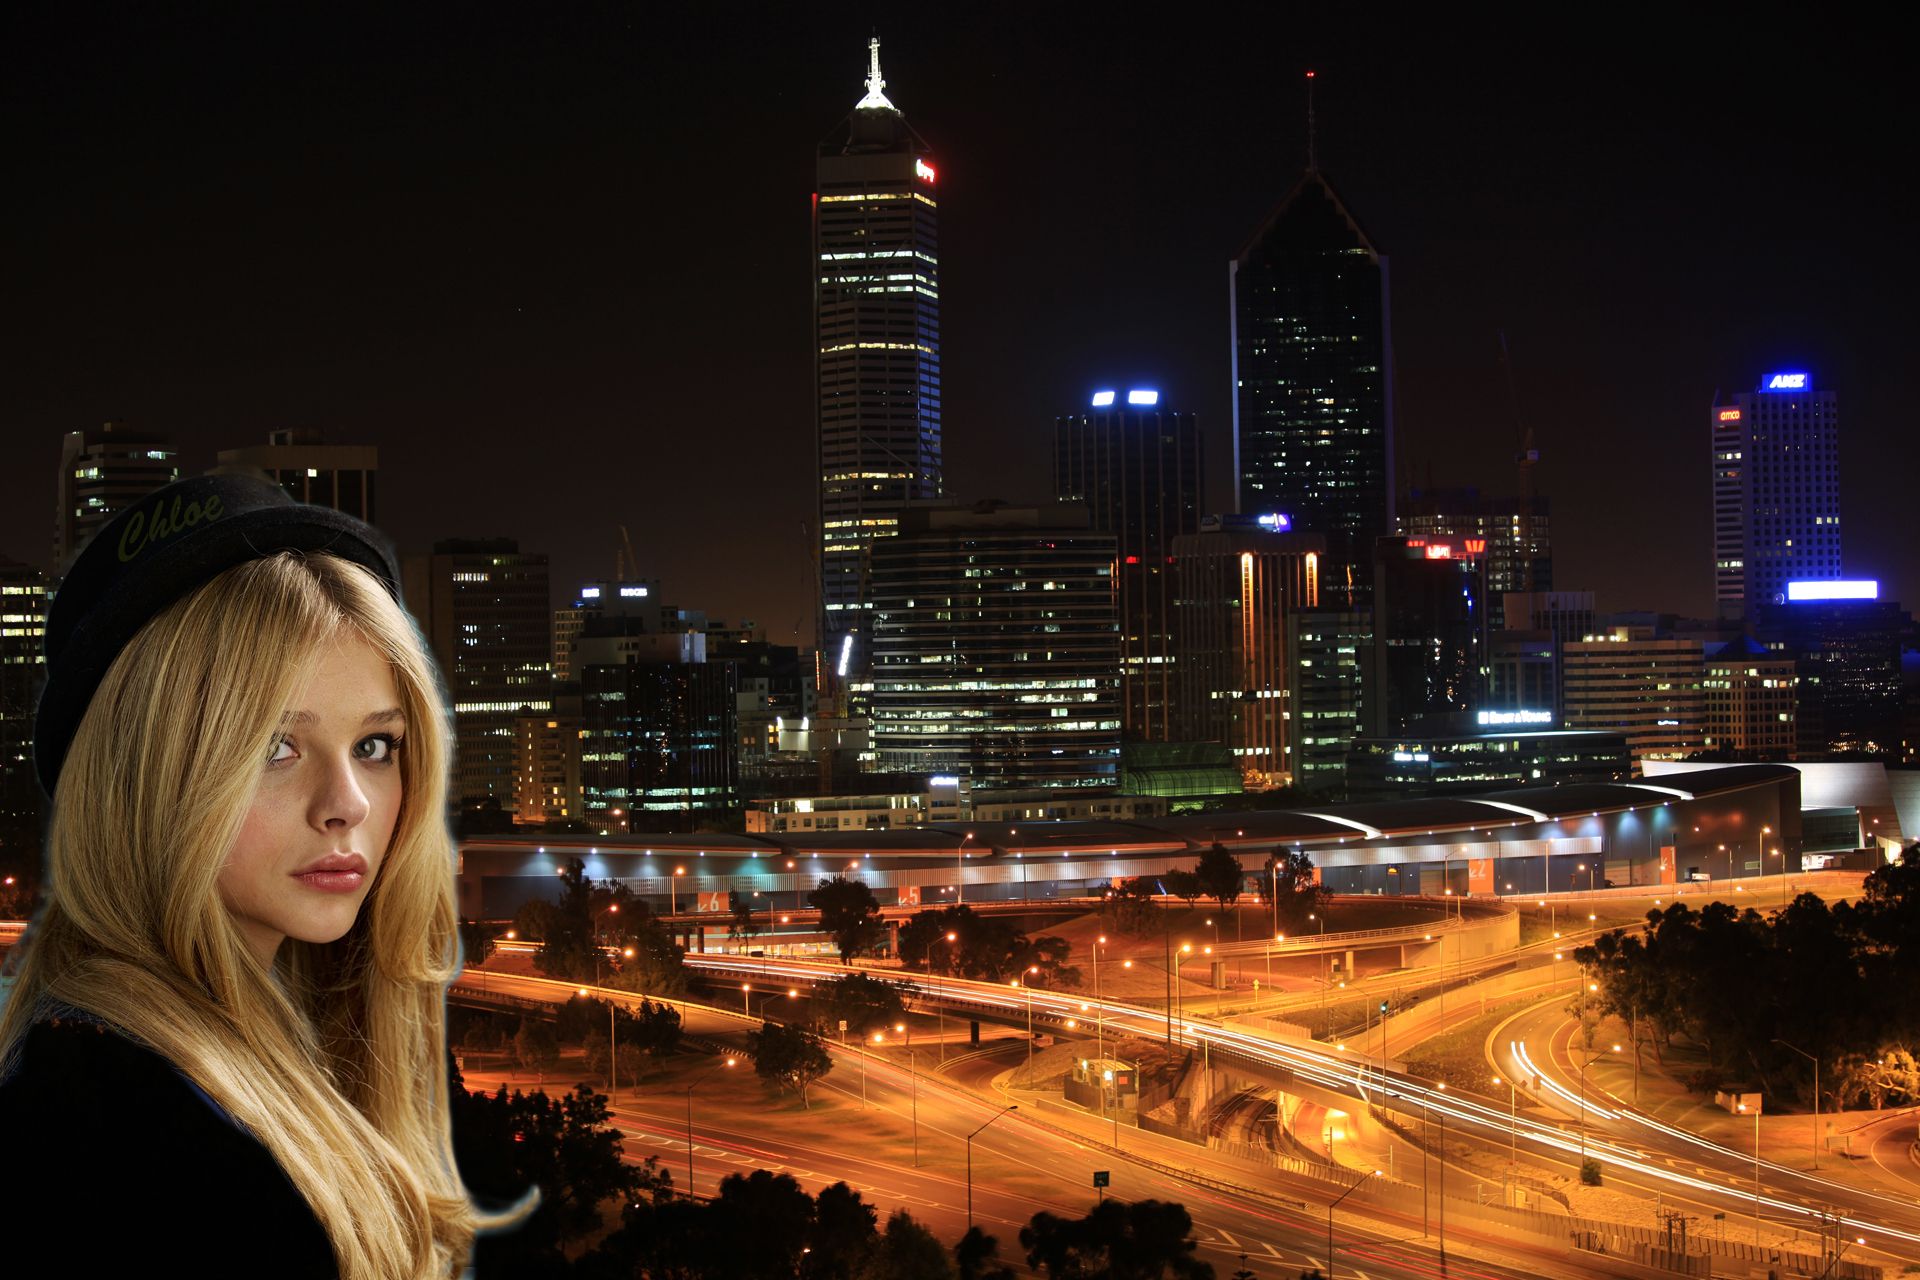 Chloe city lights